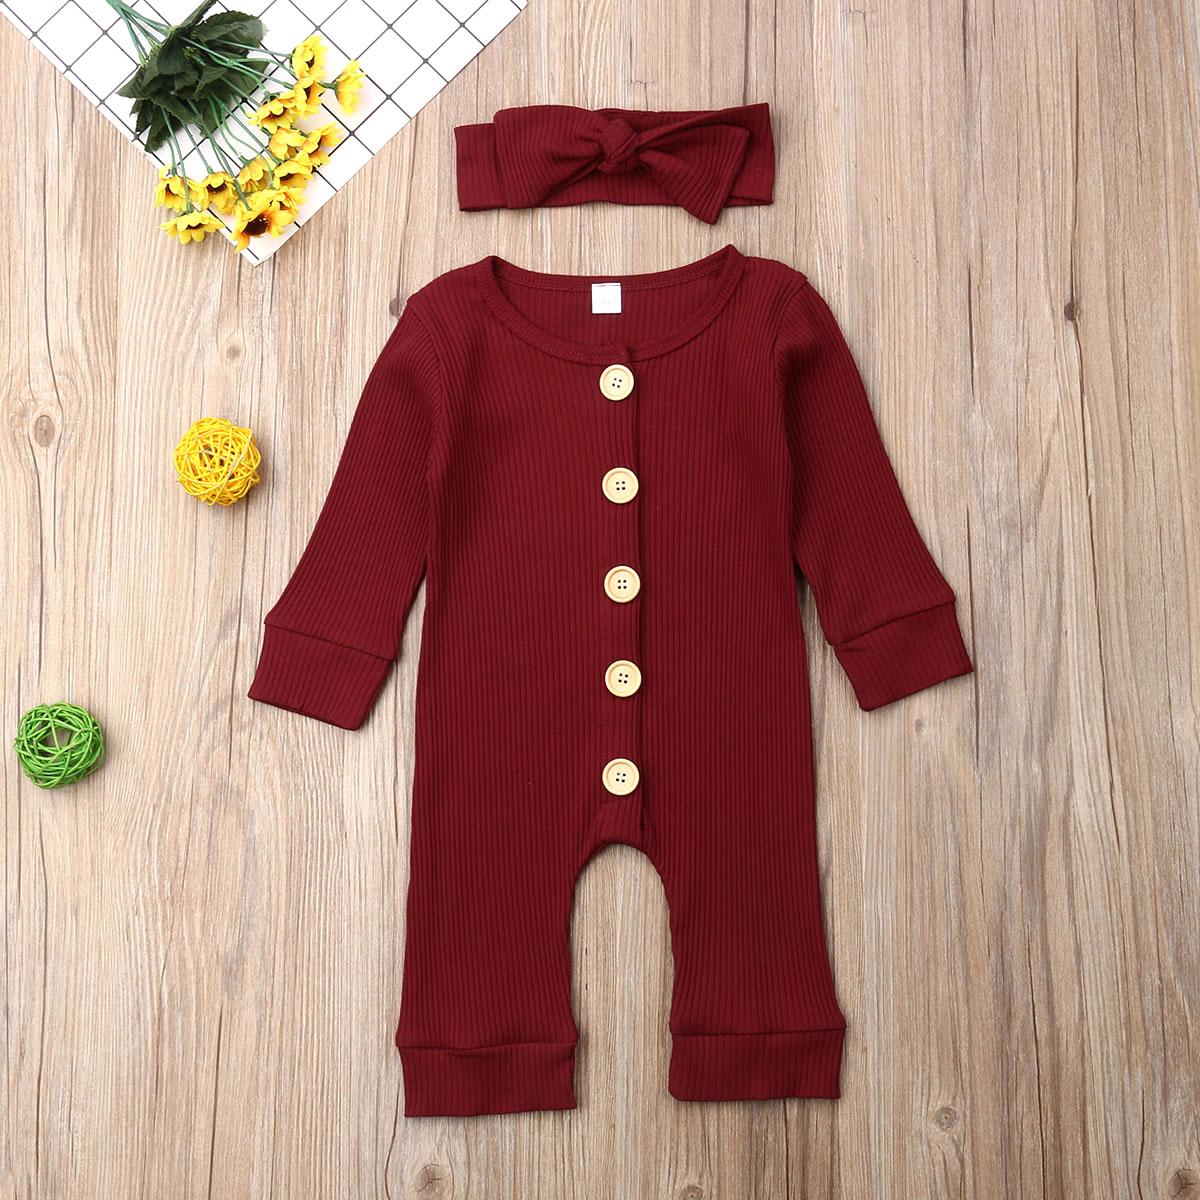 Hffdb4b3a528445dab595f1baea89df3cD Spring Fall Newborn Baby Girl Boy Clothes Long Sleeve Knitted Romper + Headband Jumpsuit 2PCS Outfit 0-24M